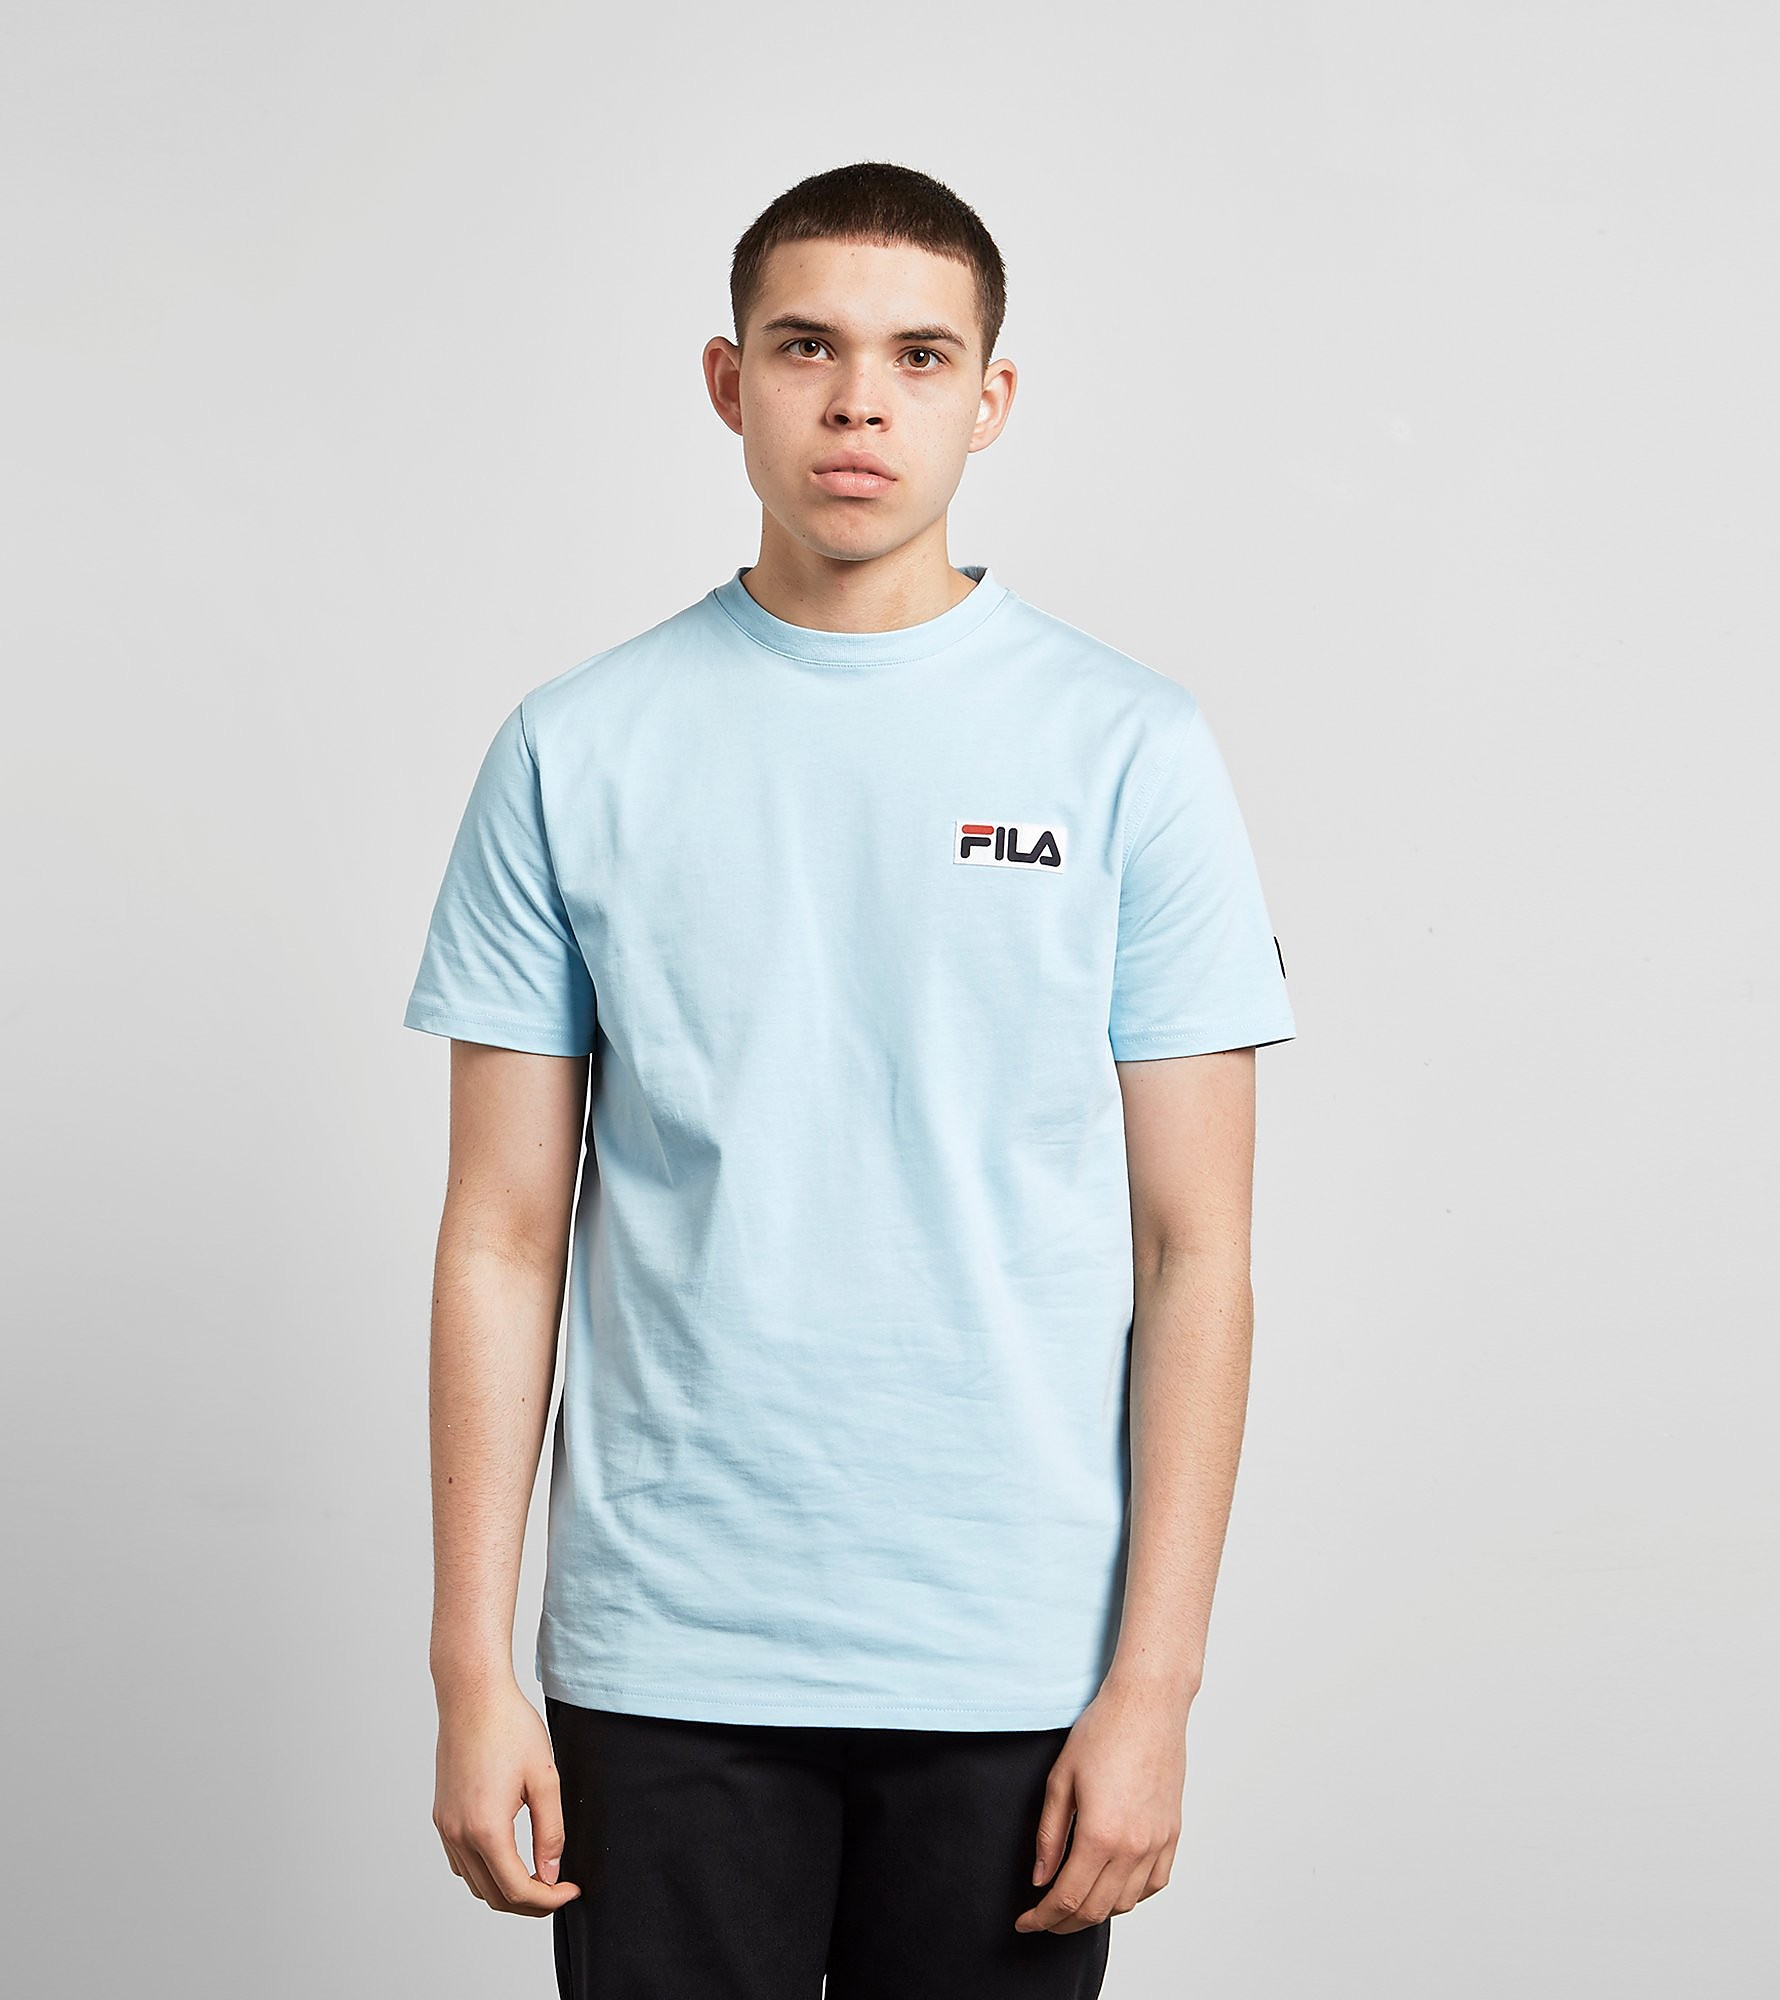 Fila Breeze T-Shirt - size? Exclusive